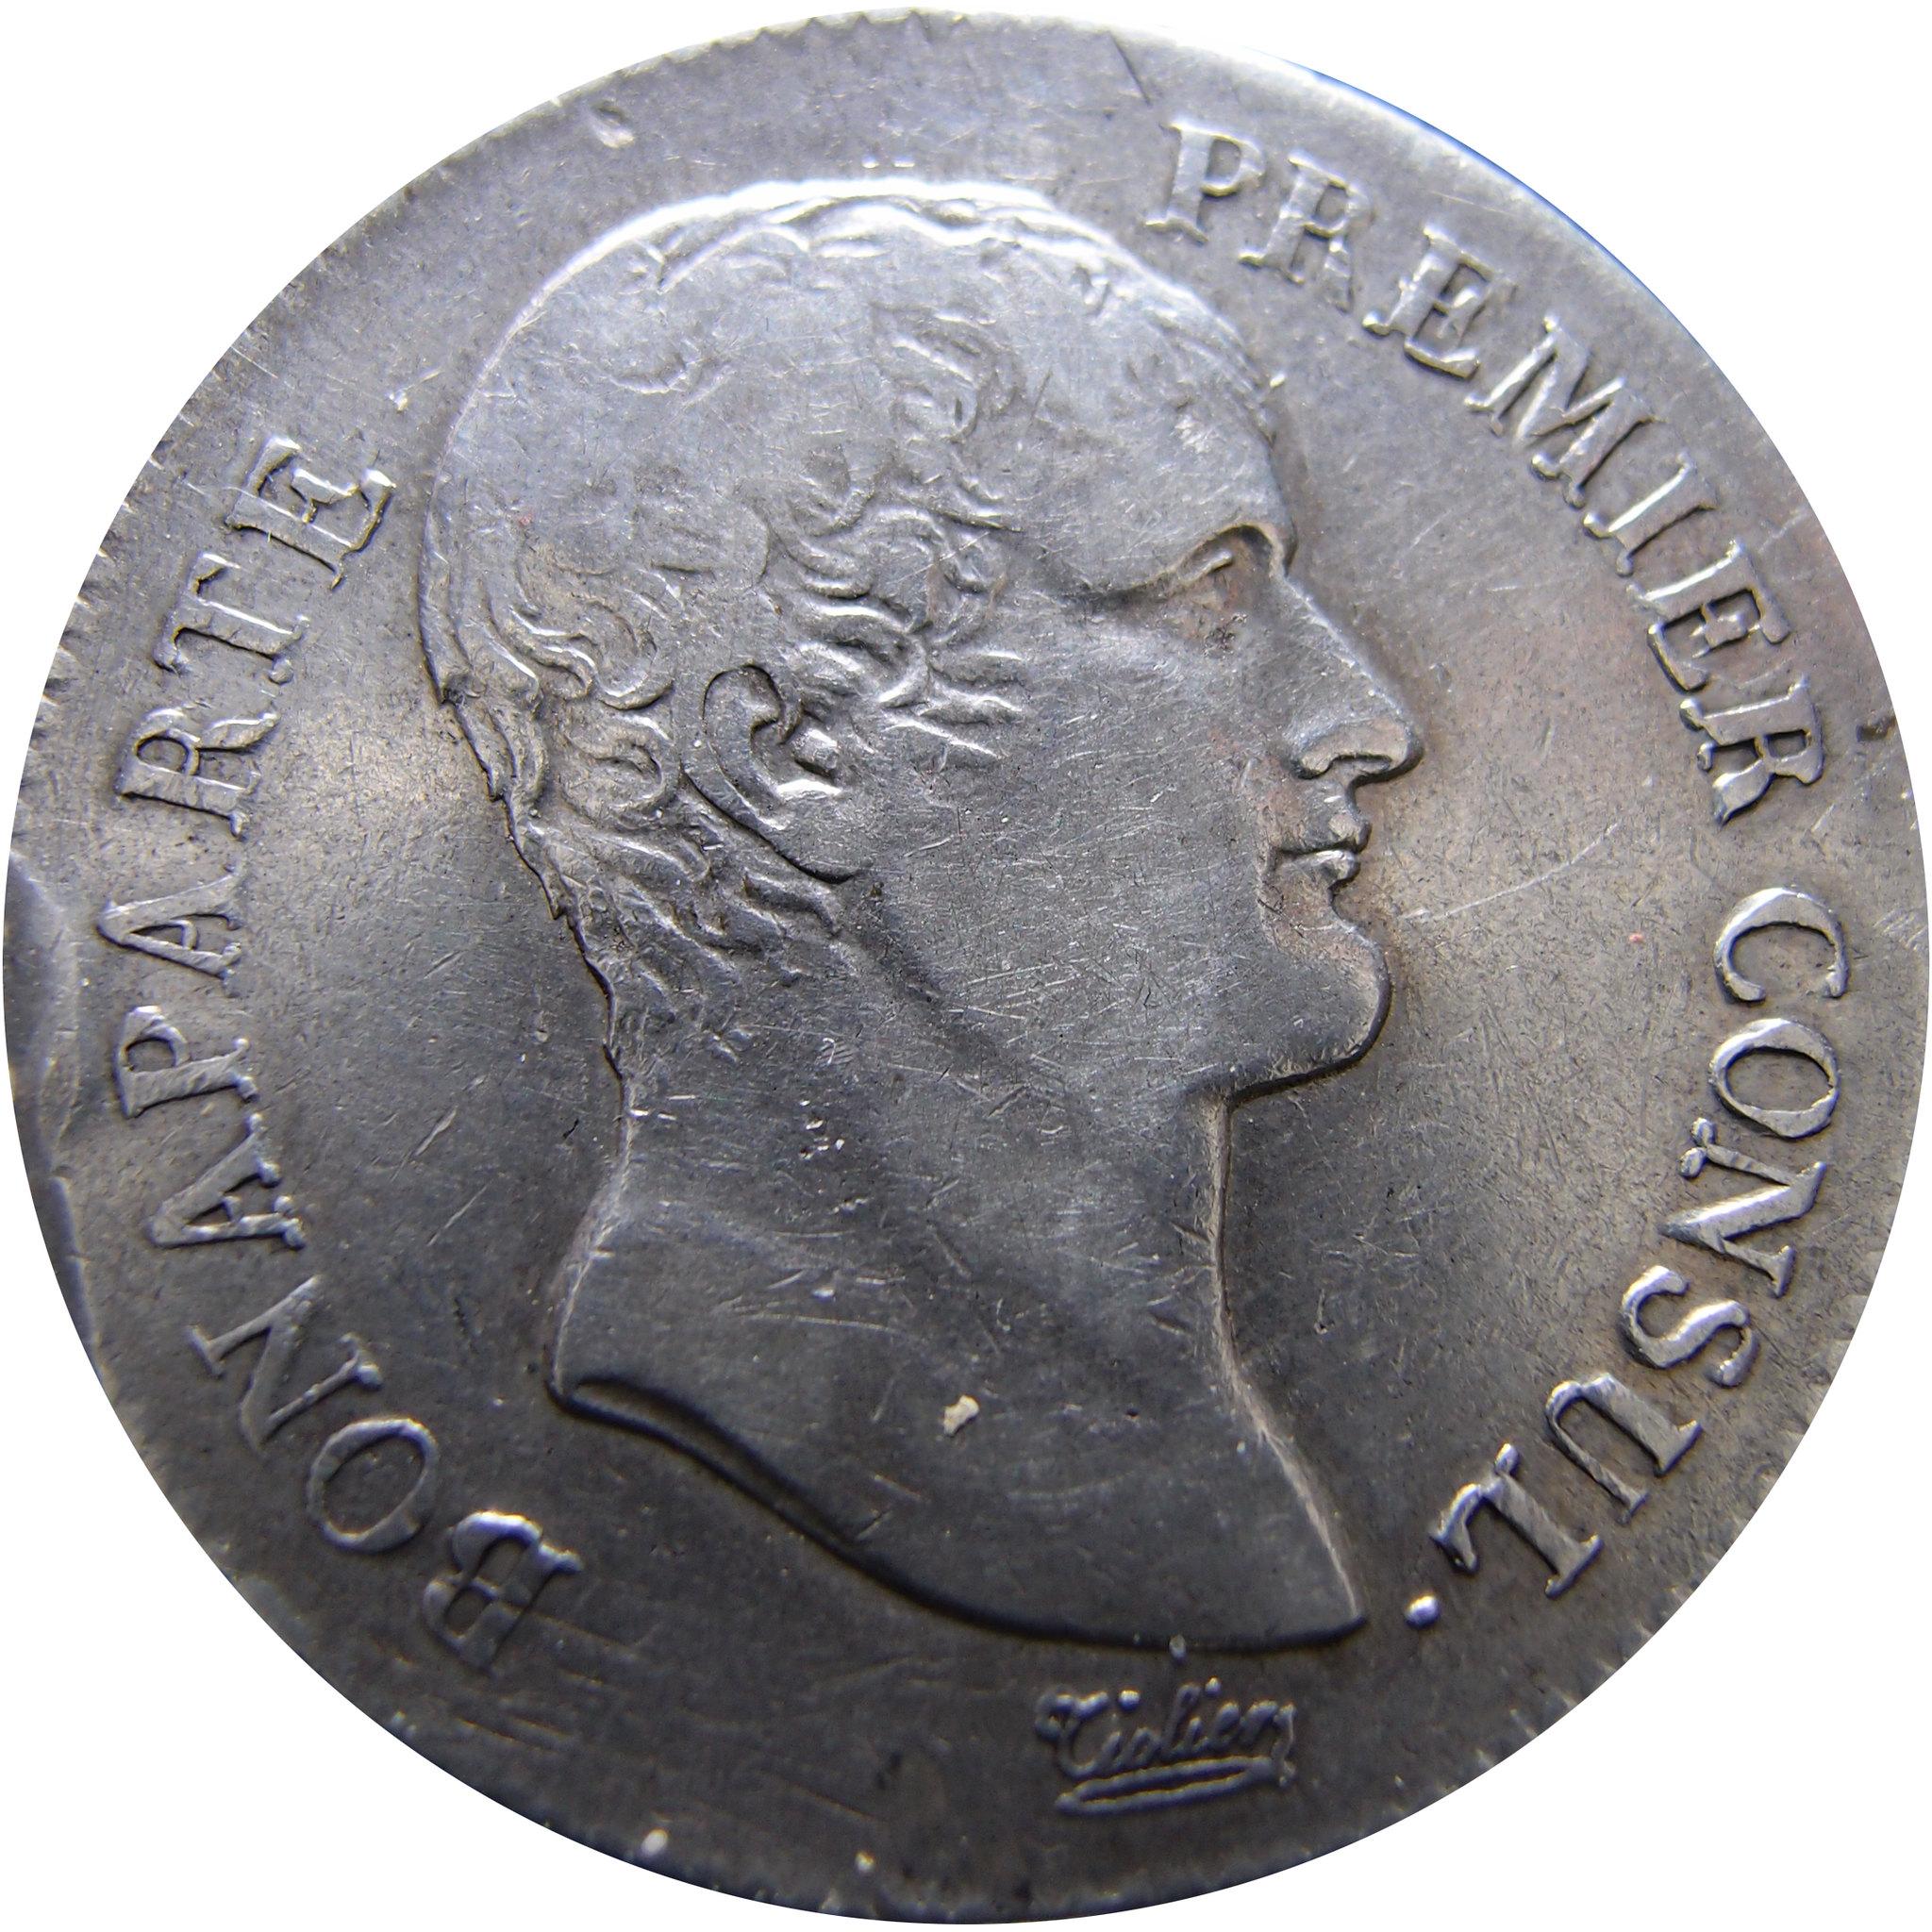 5 Francs. Francia. 1804. Toulouse 8756939505_b317e612dd_k